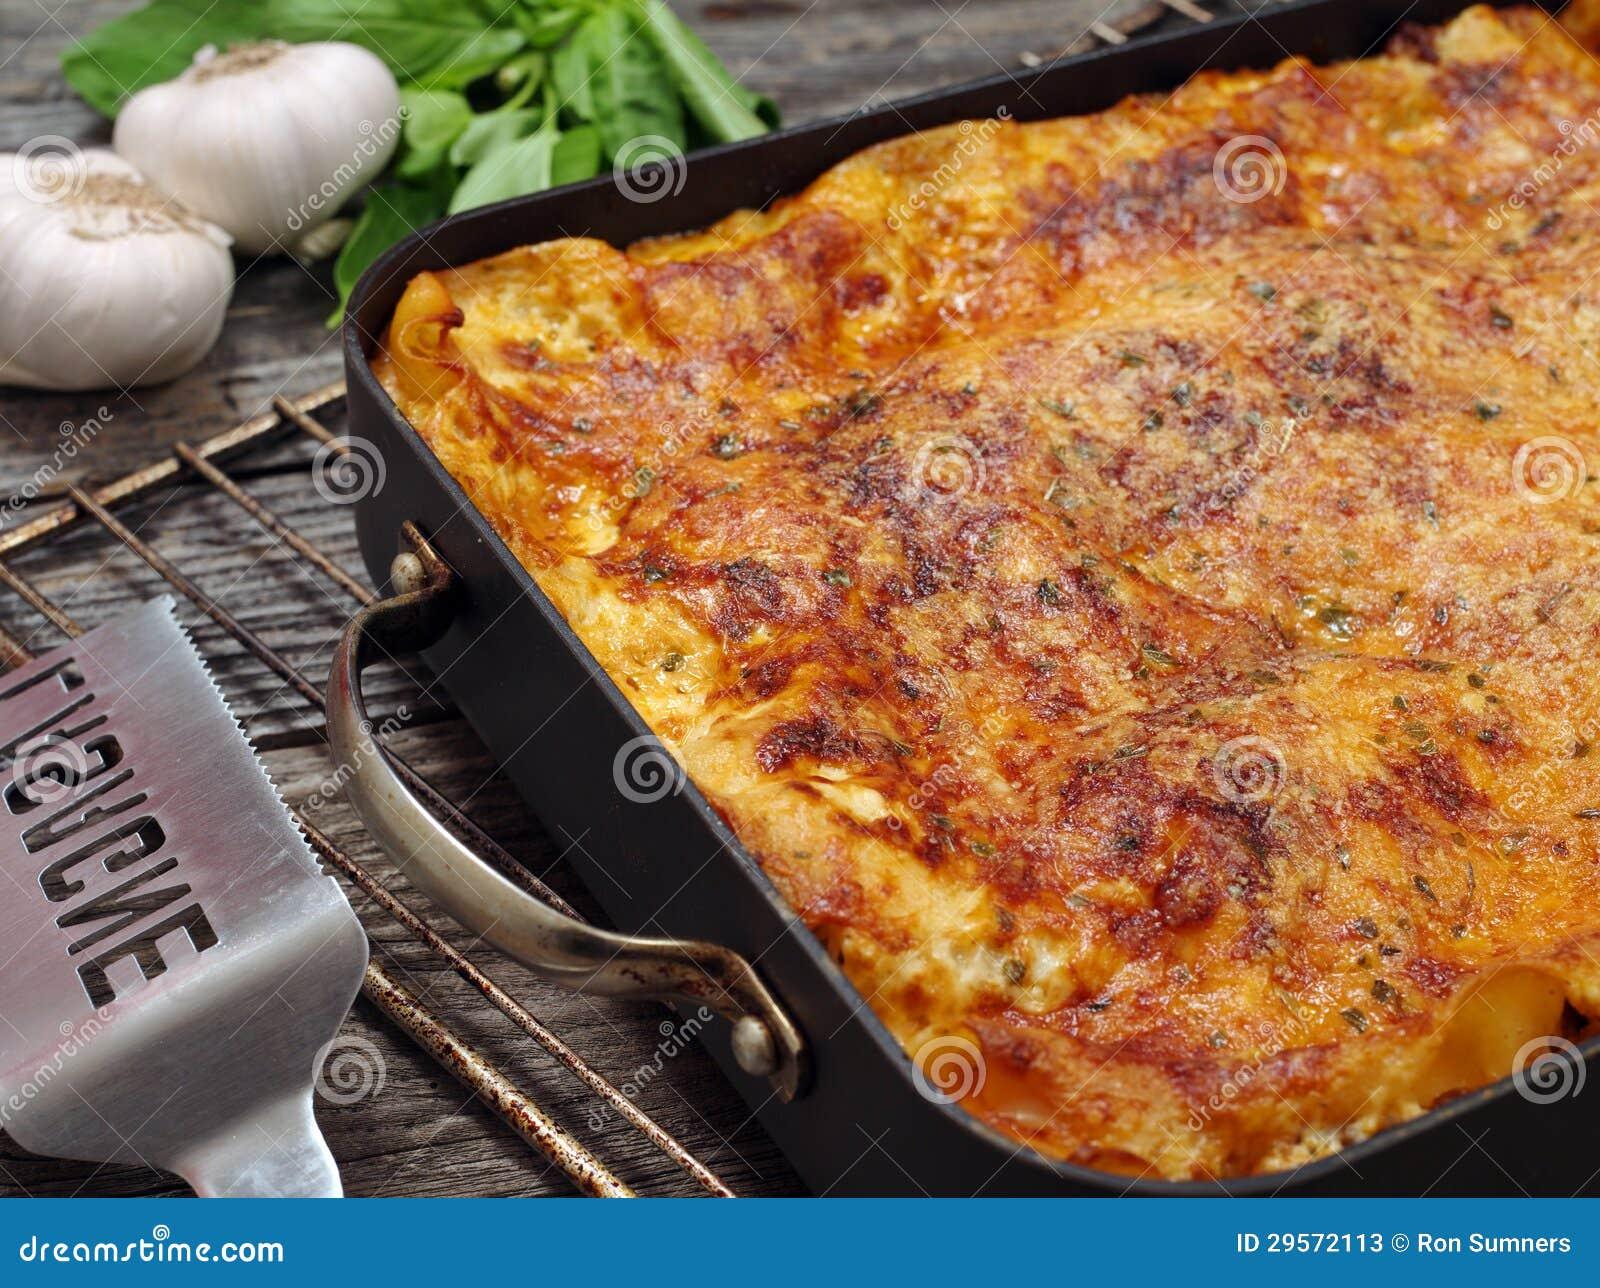 Alum's Butternut Squash Lasagna Recipe for Thanksgiving Pizzazz